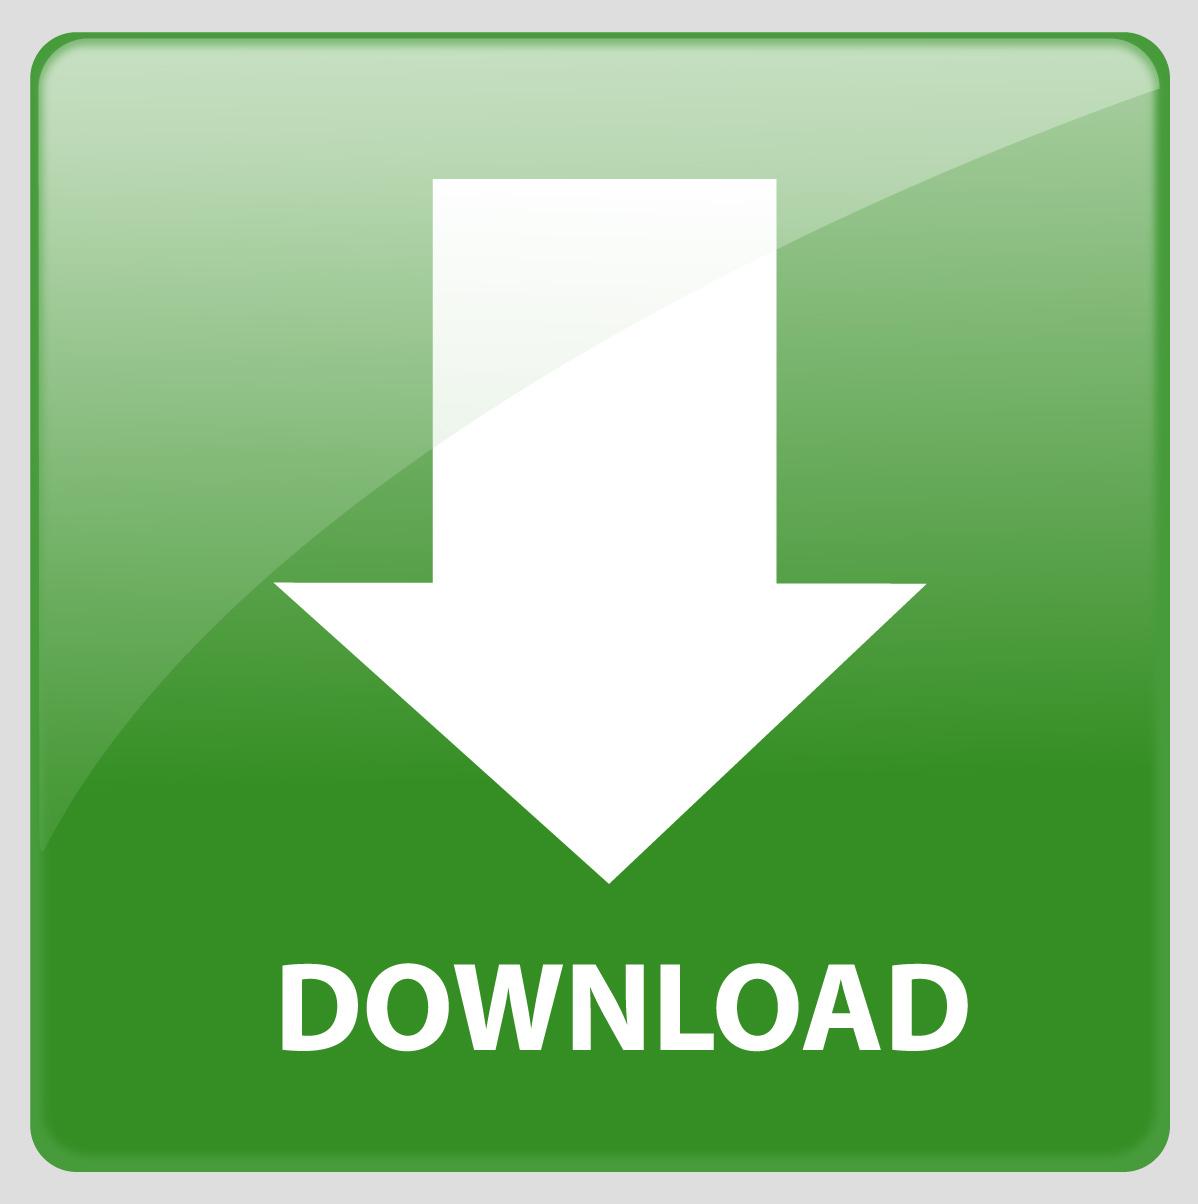 DPS_download